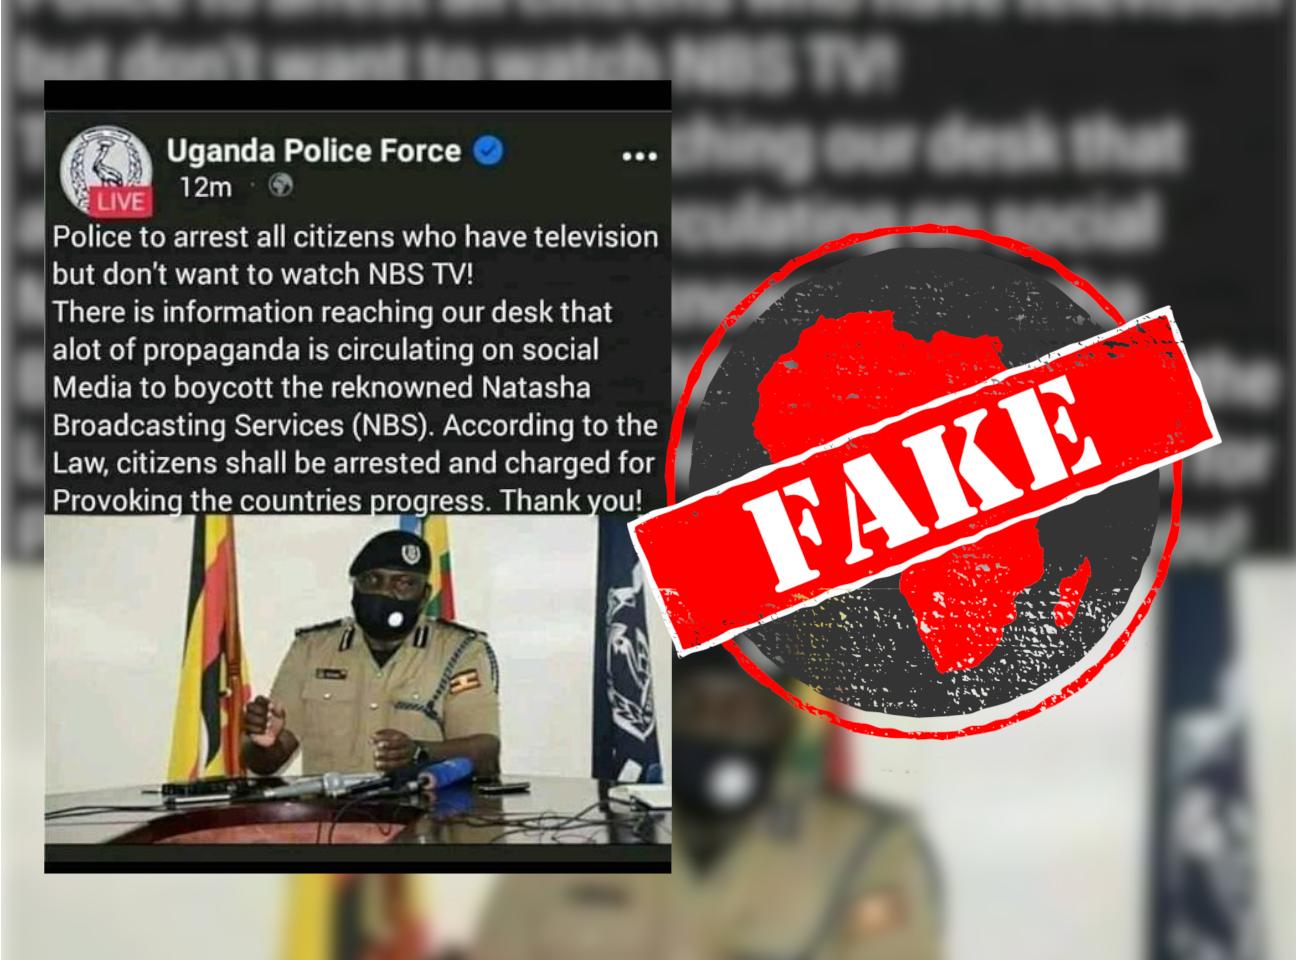 Police_Fake